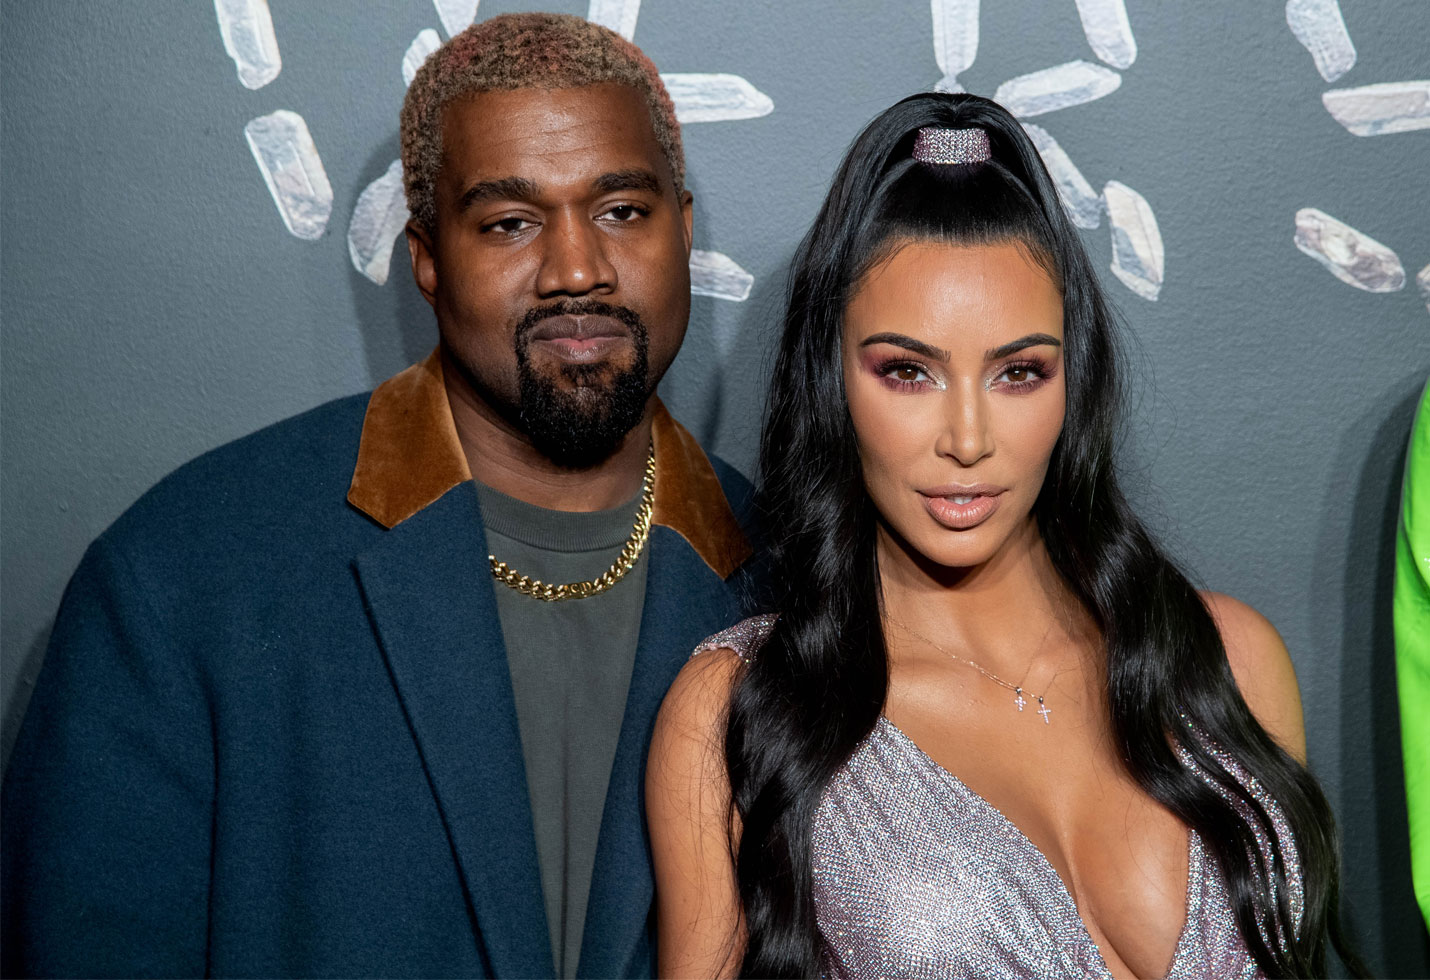 Kim Kardashian & Kanye West Welcome Baby Number 4